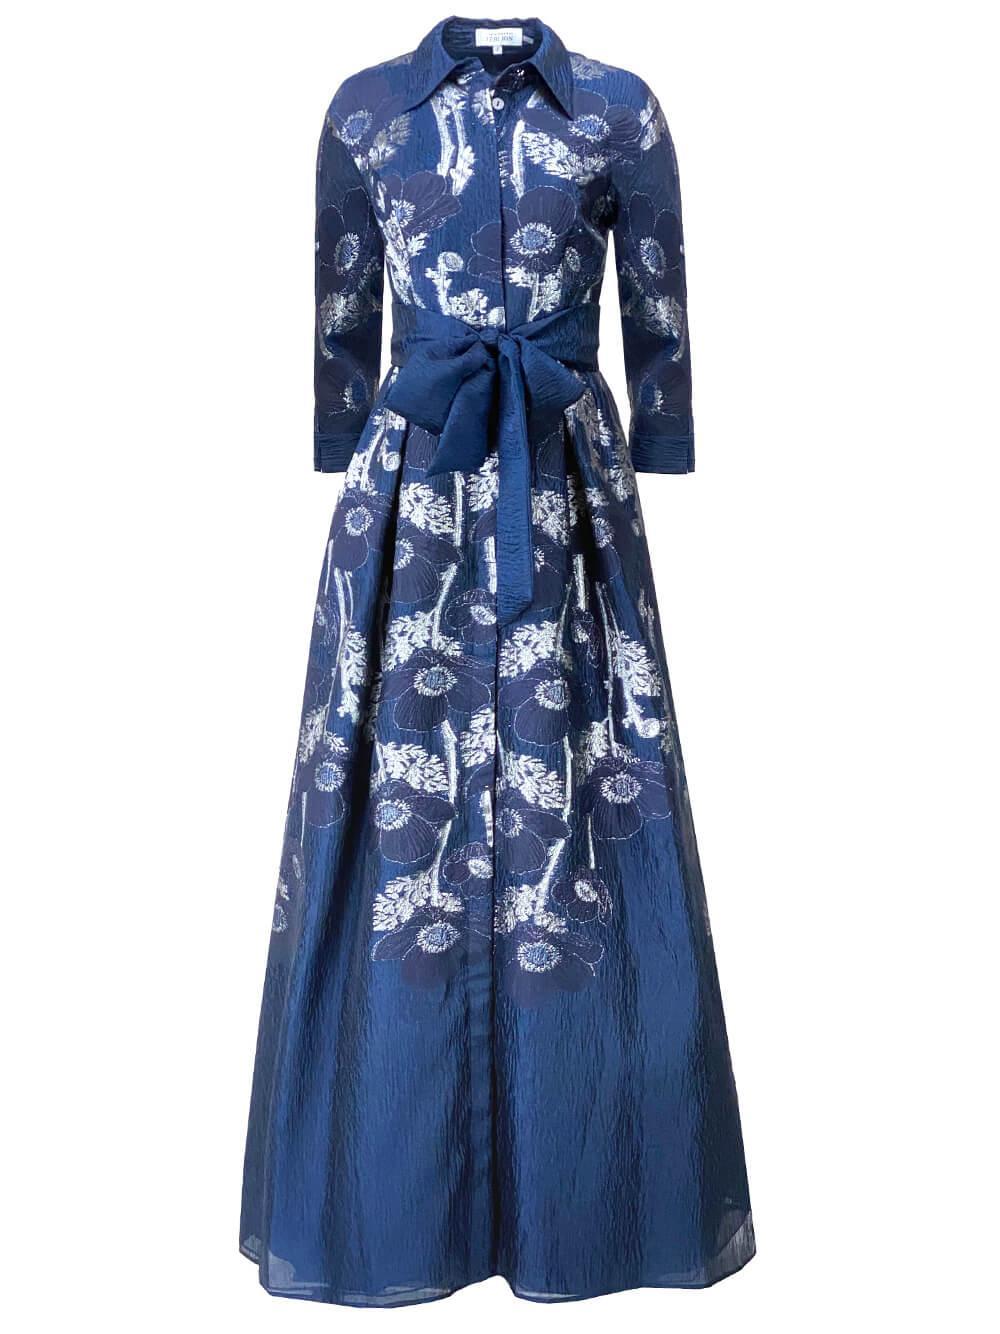 Metallic Jacquard Shirt Dress Gown Item # 217022